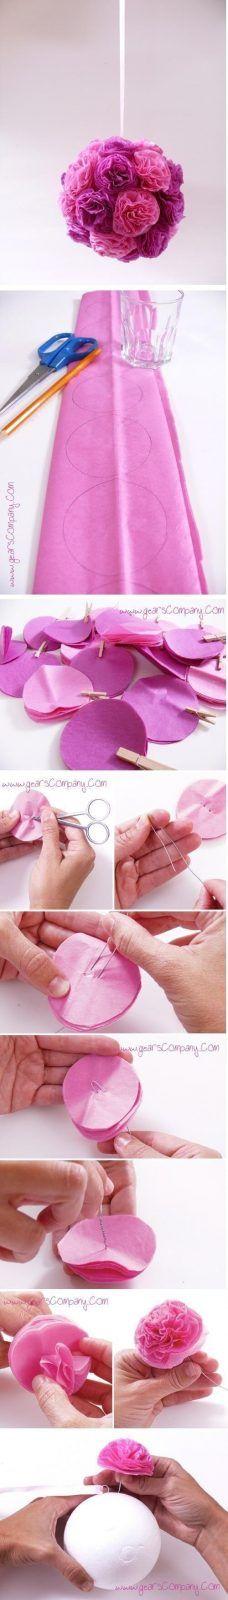 Pom-Poms aus Papier basteln - Rosen-Ball (Diy Paper Pom Poms)